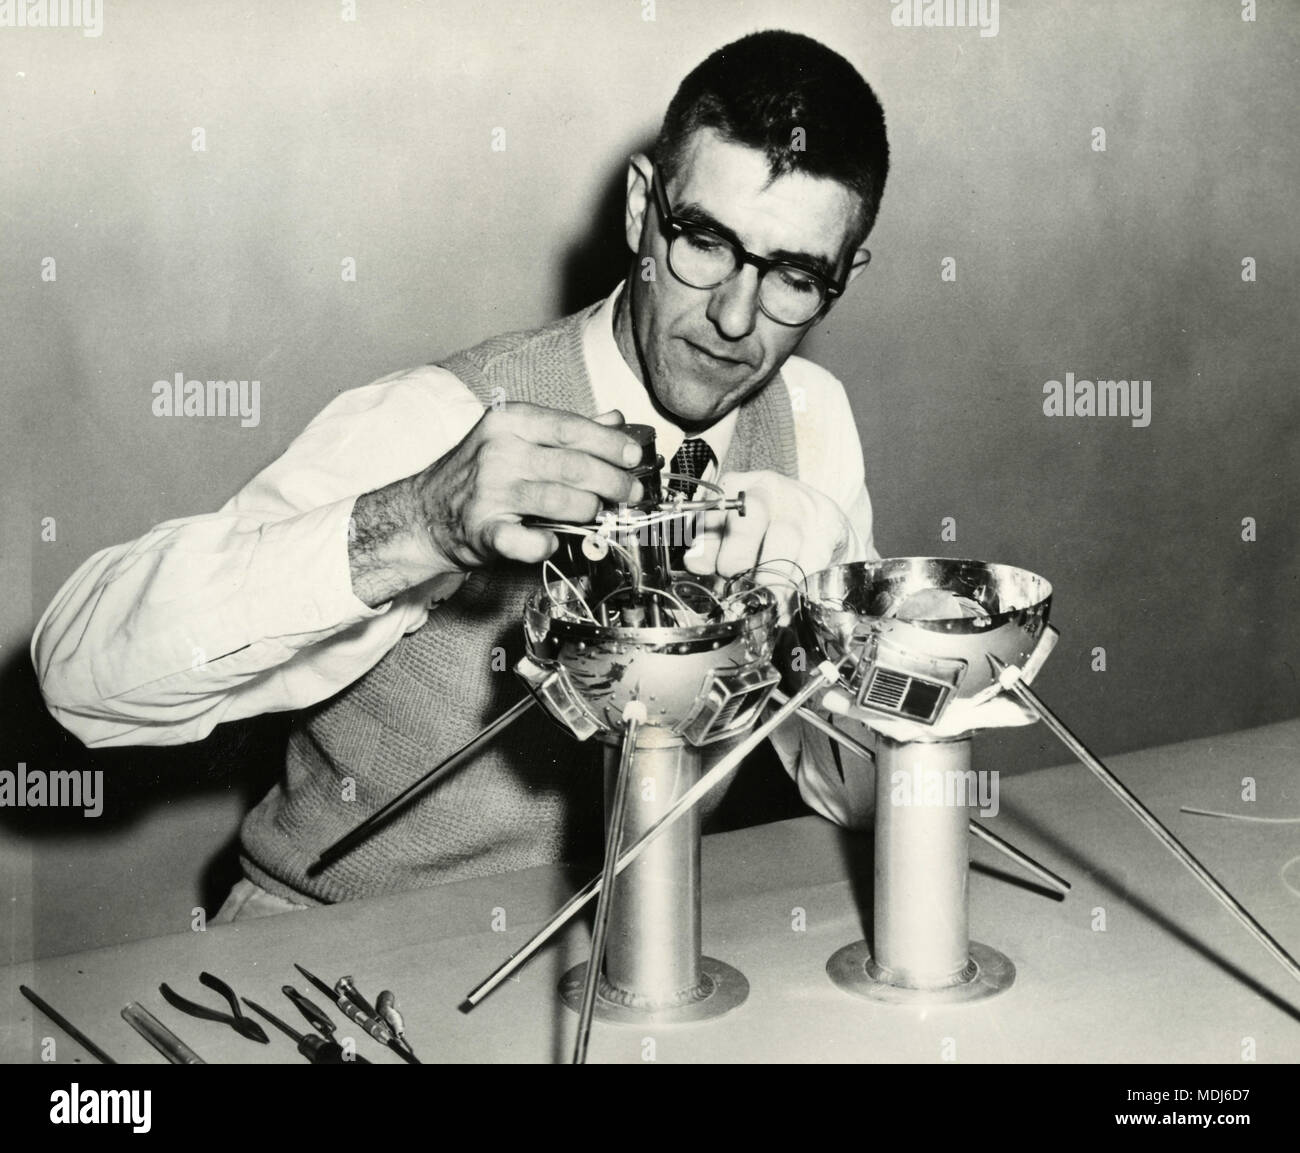 Scientist building artificial satellites, USA 1950s - Stock Image